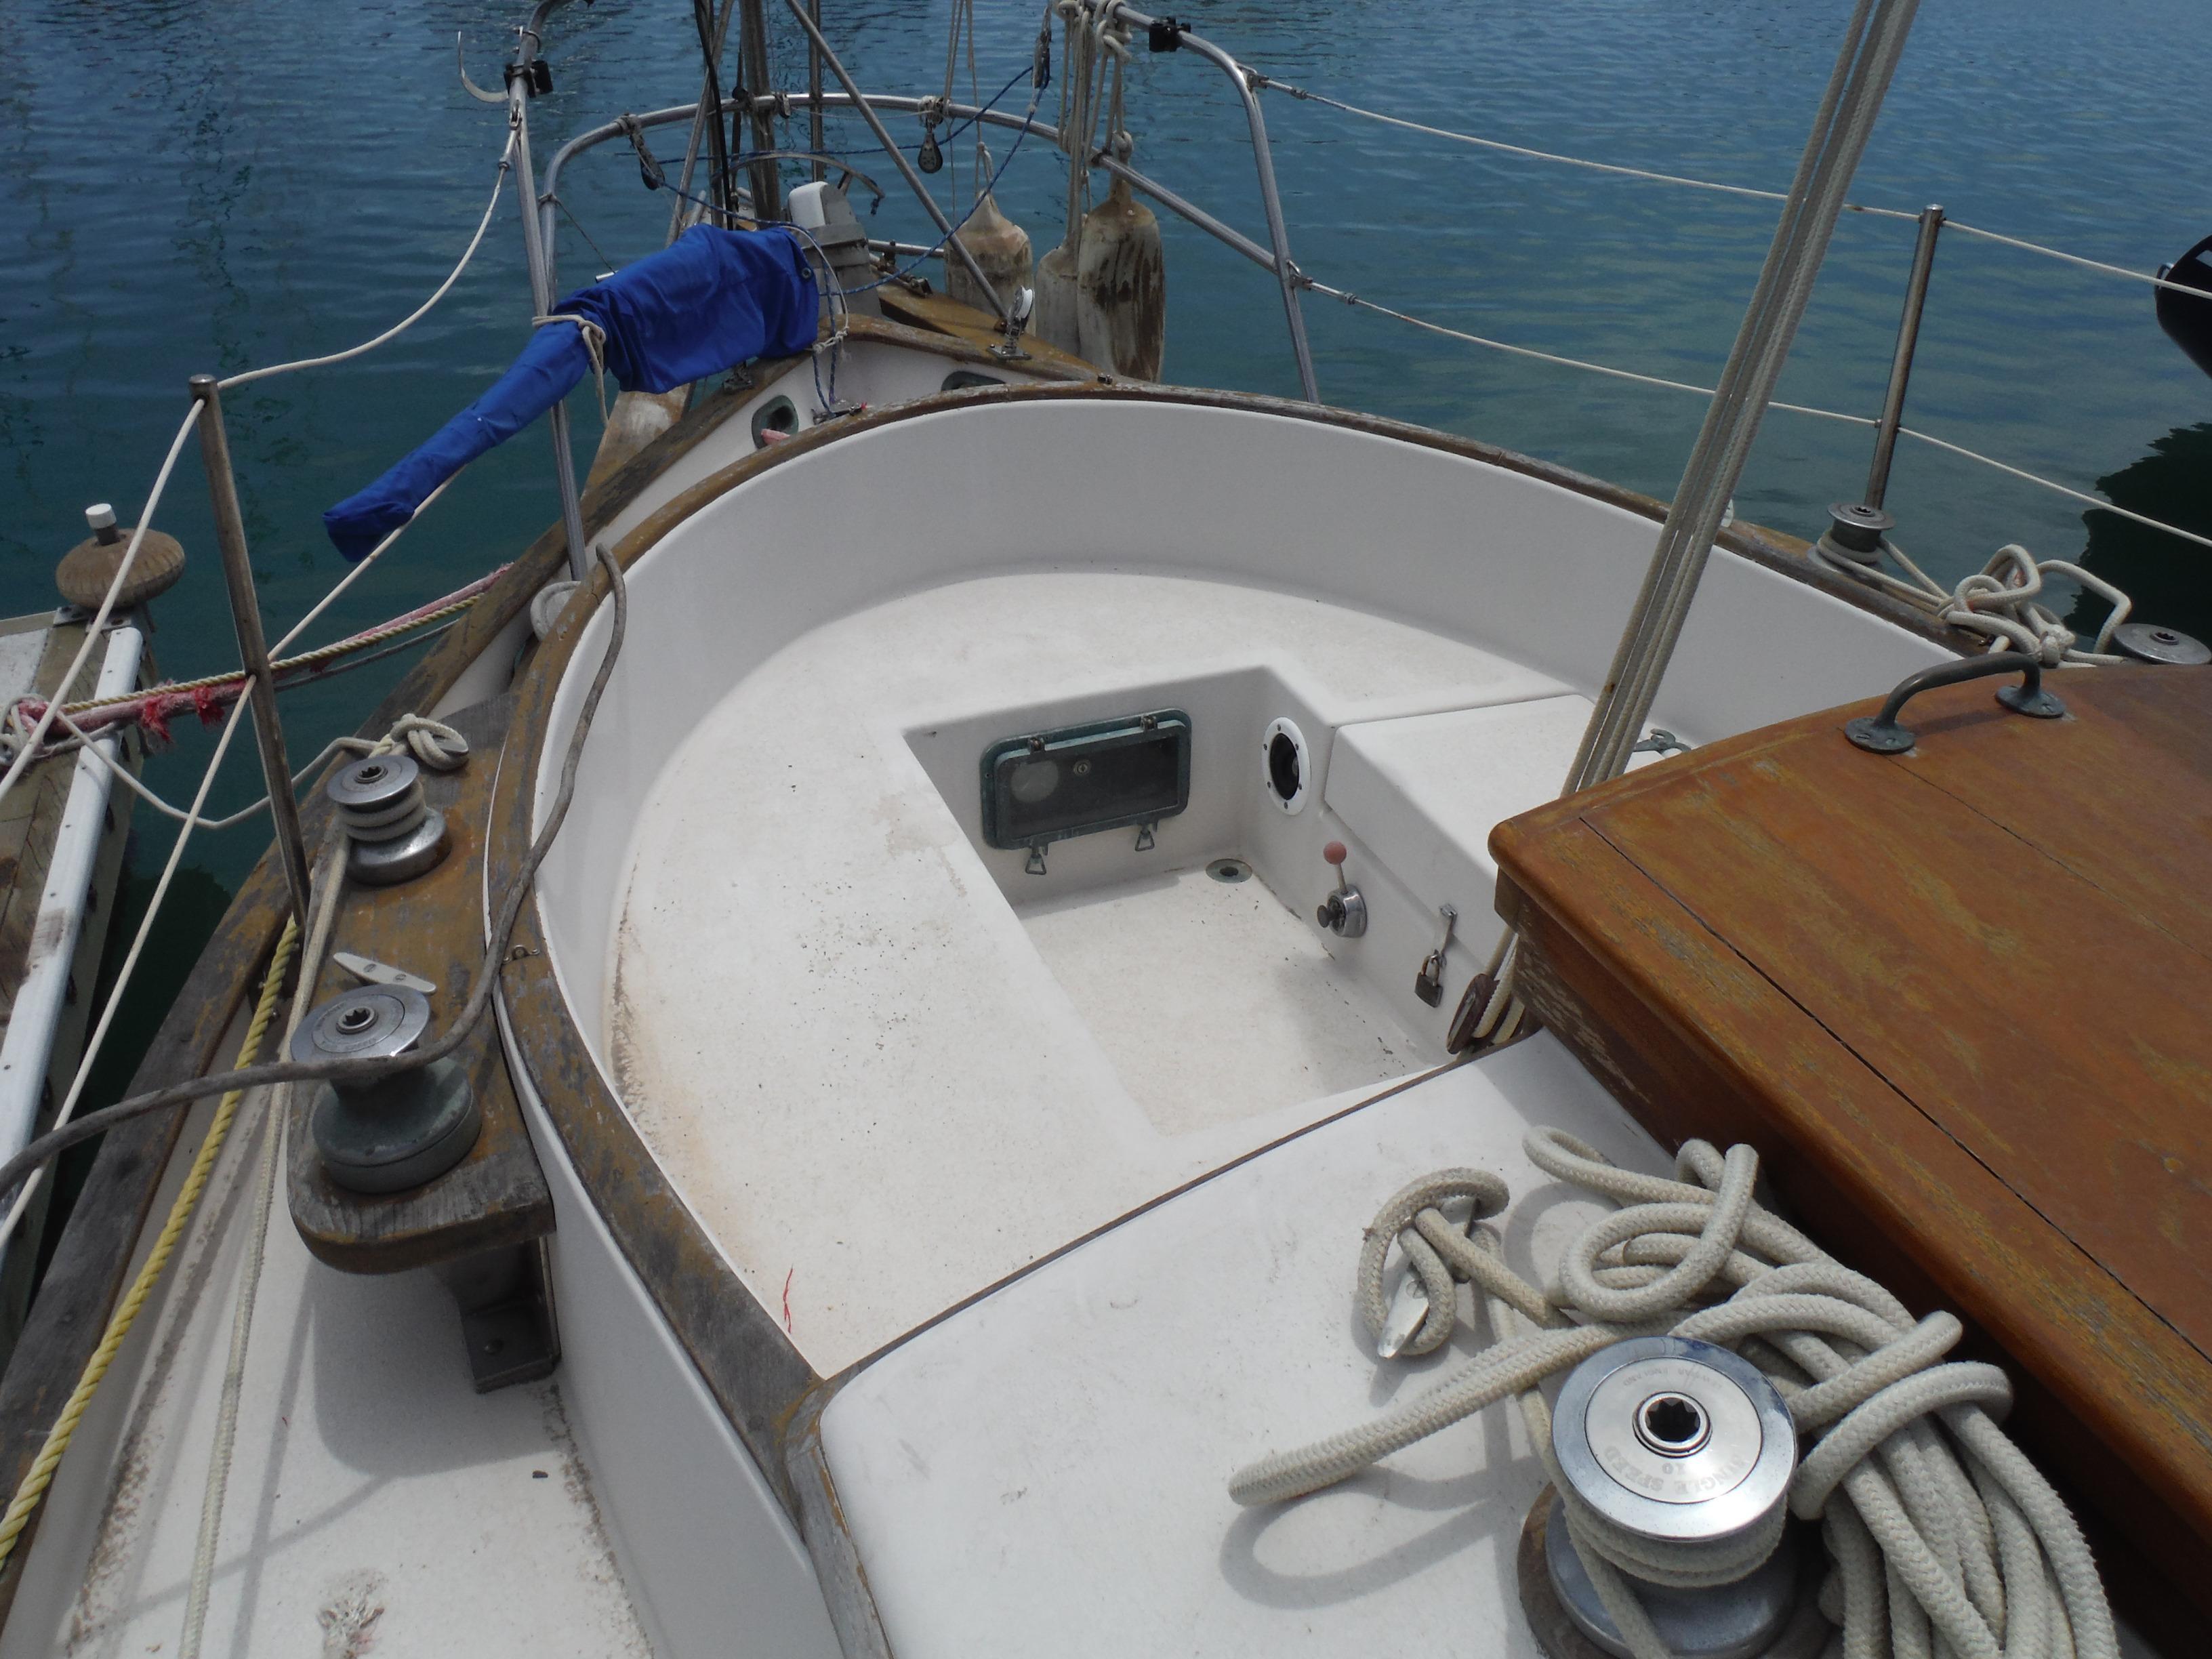 34' Noon Ocean 34 Cutter+Photo 12